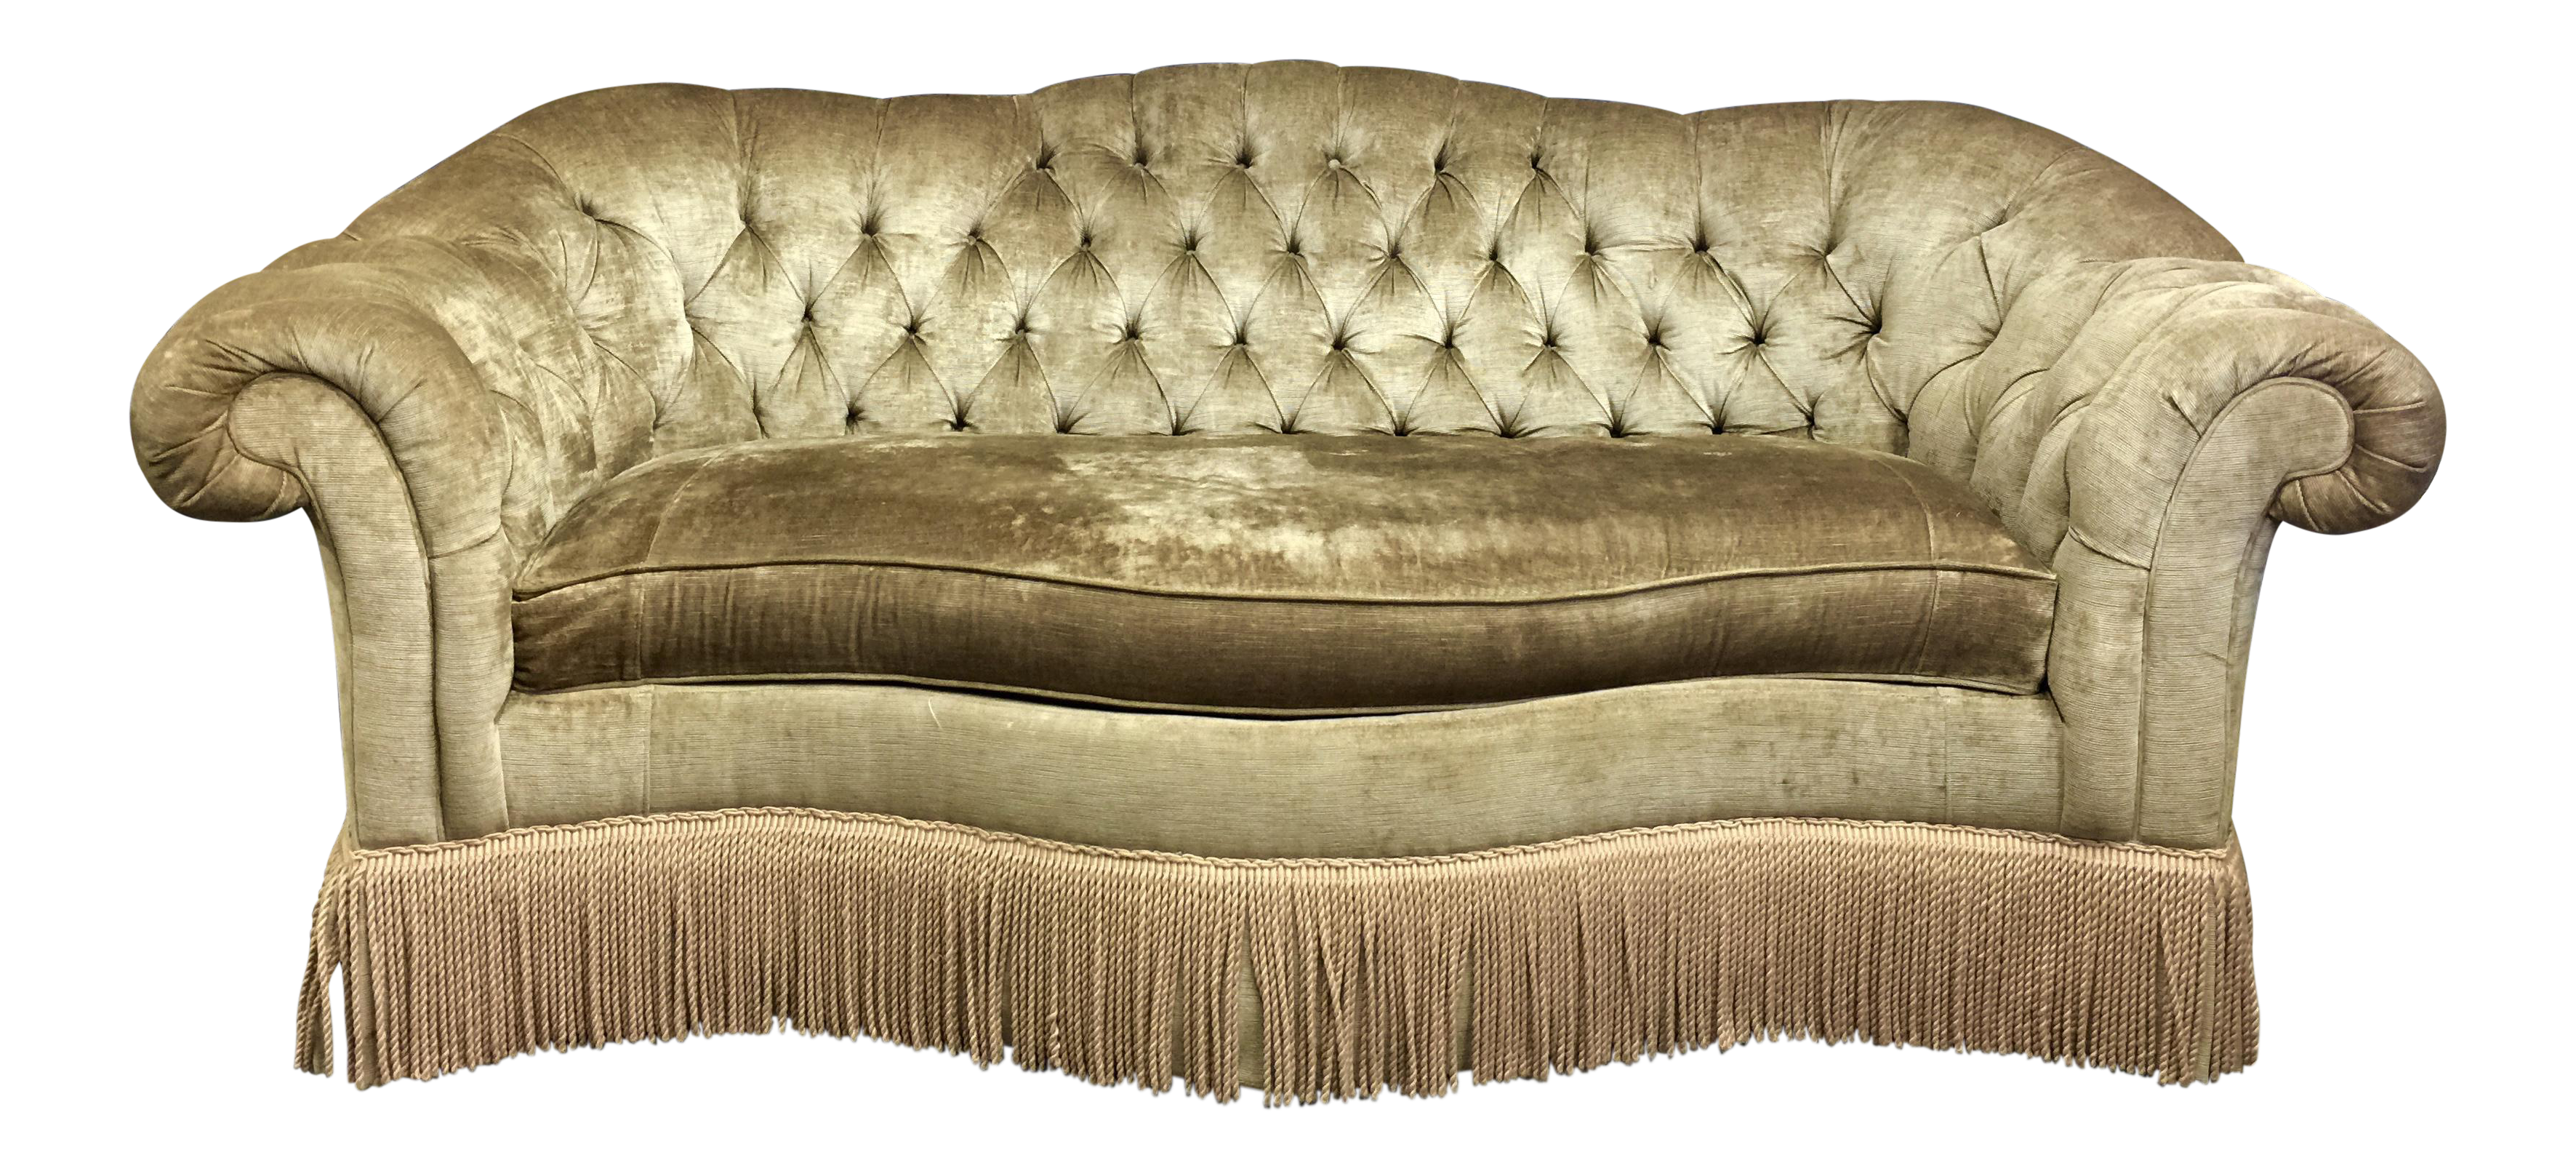 Tufted Velvet Chesterfield Sofa With Fringe By Century